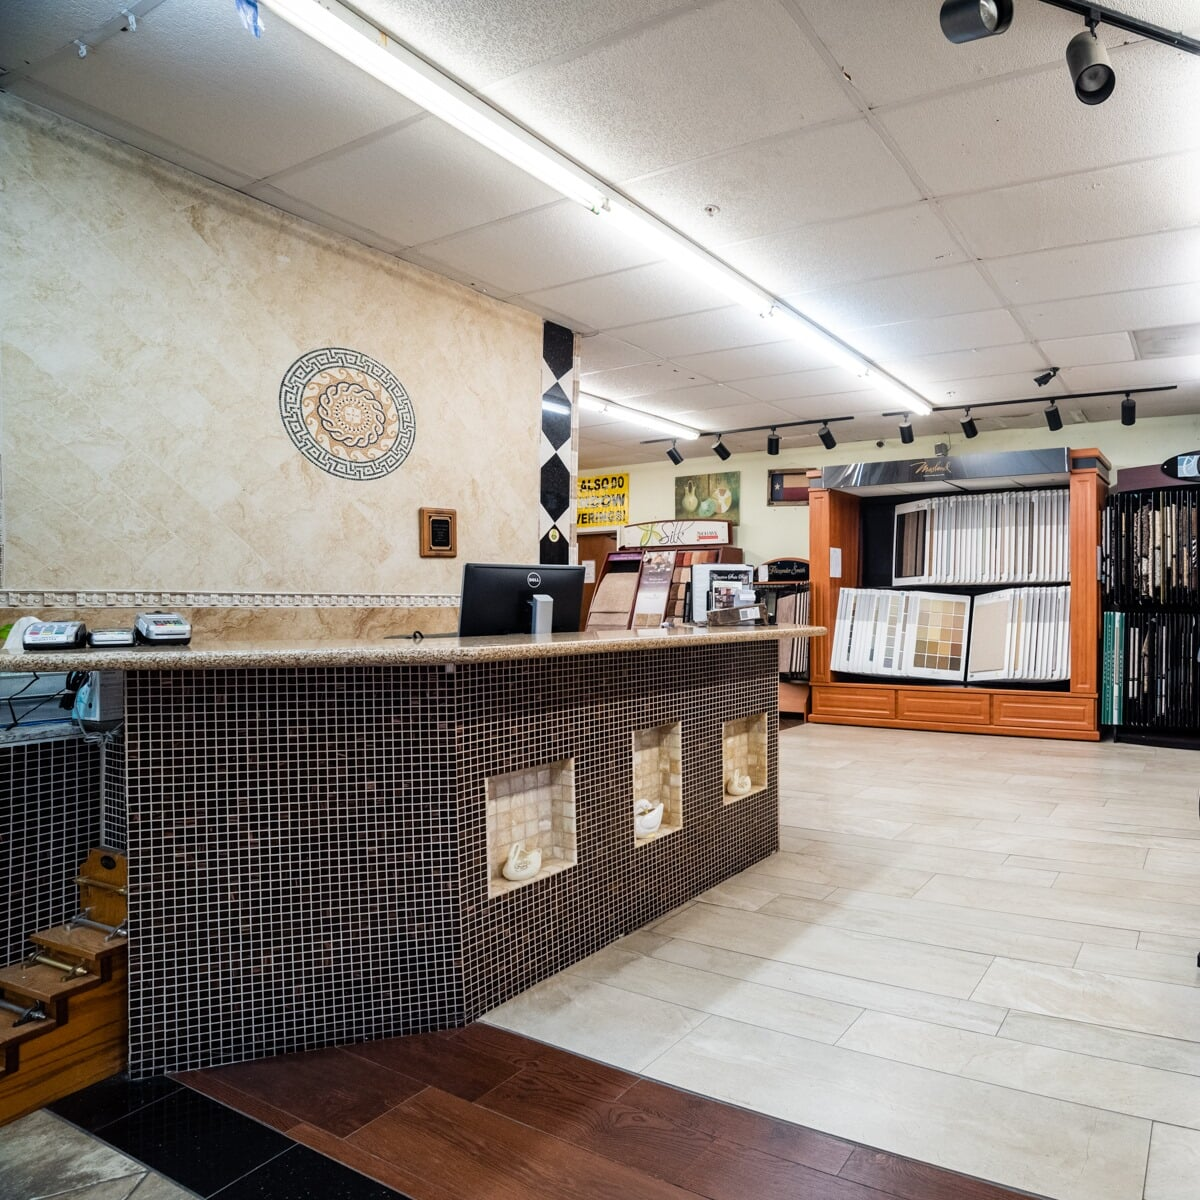 Colony Flooring & Design Inc showroom near Missouri City, TX